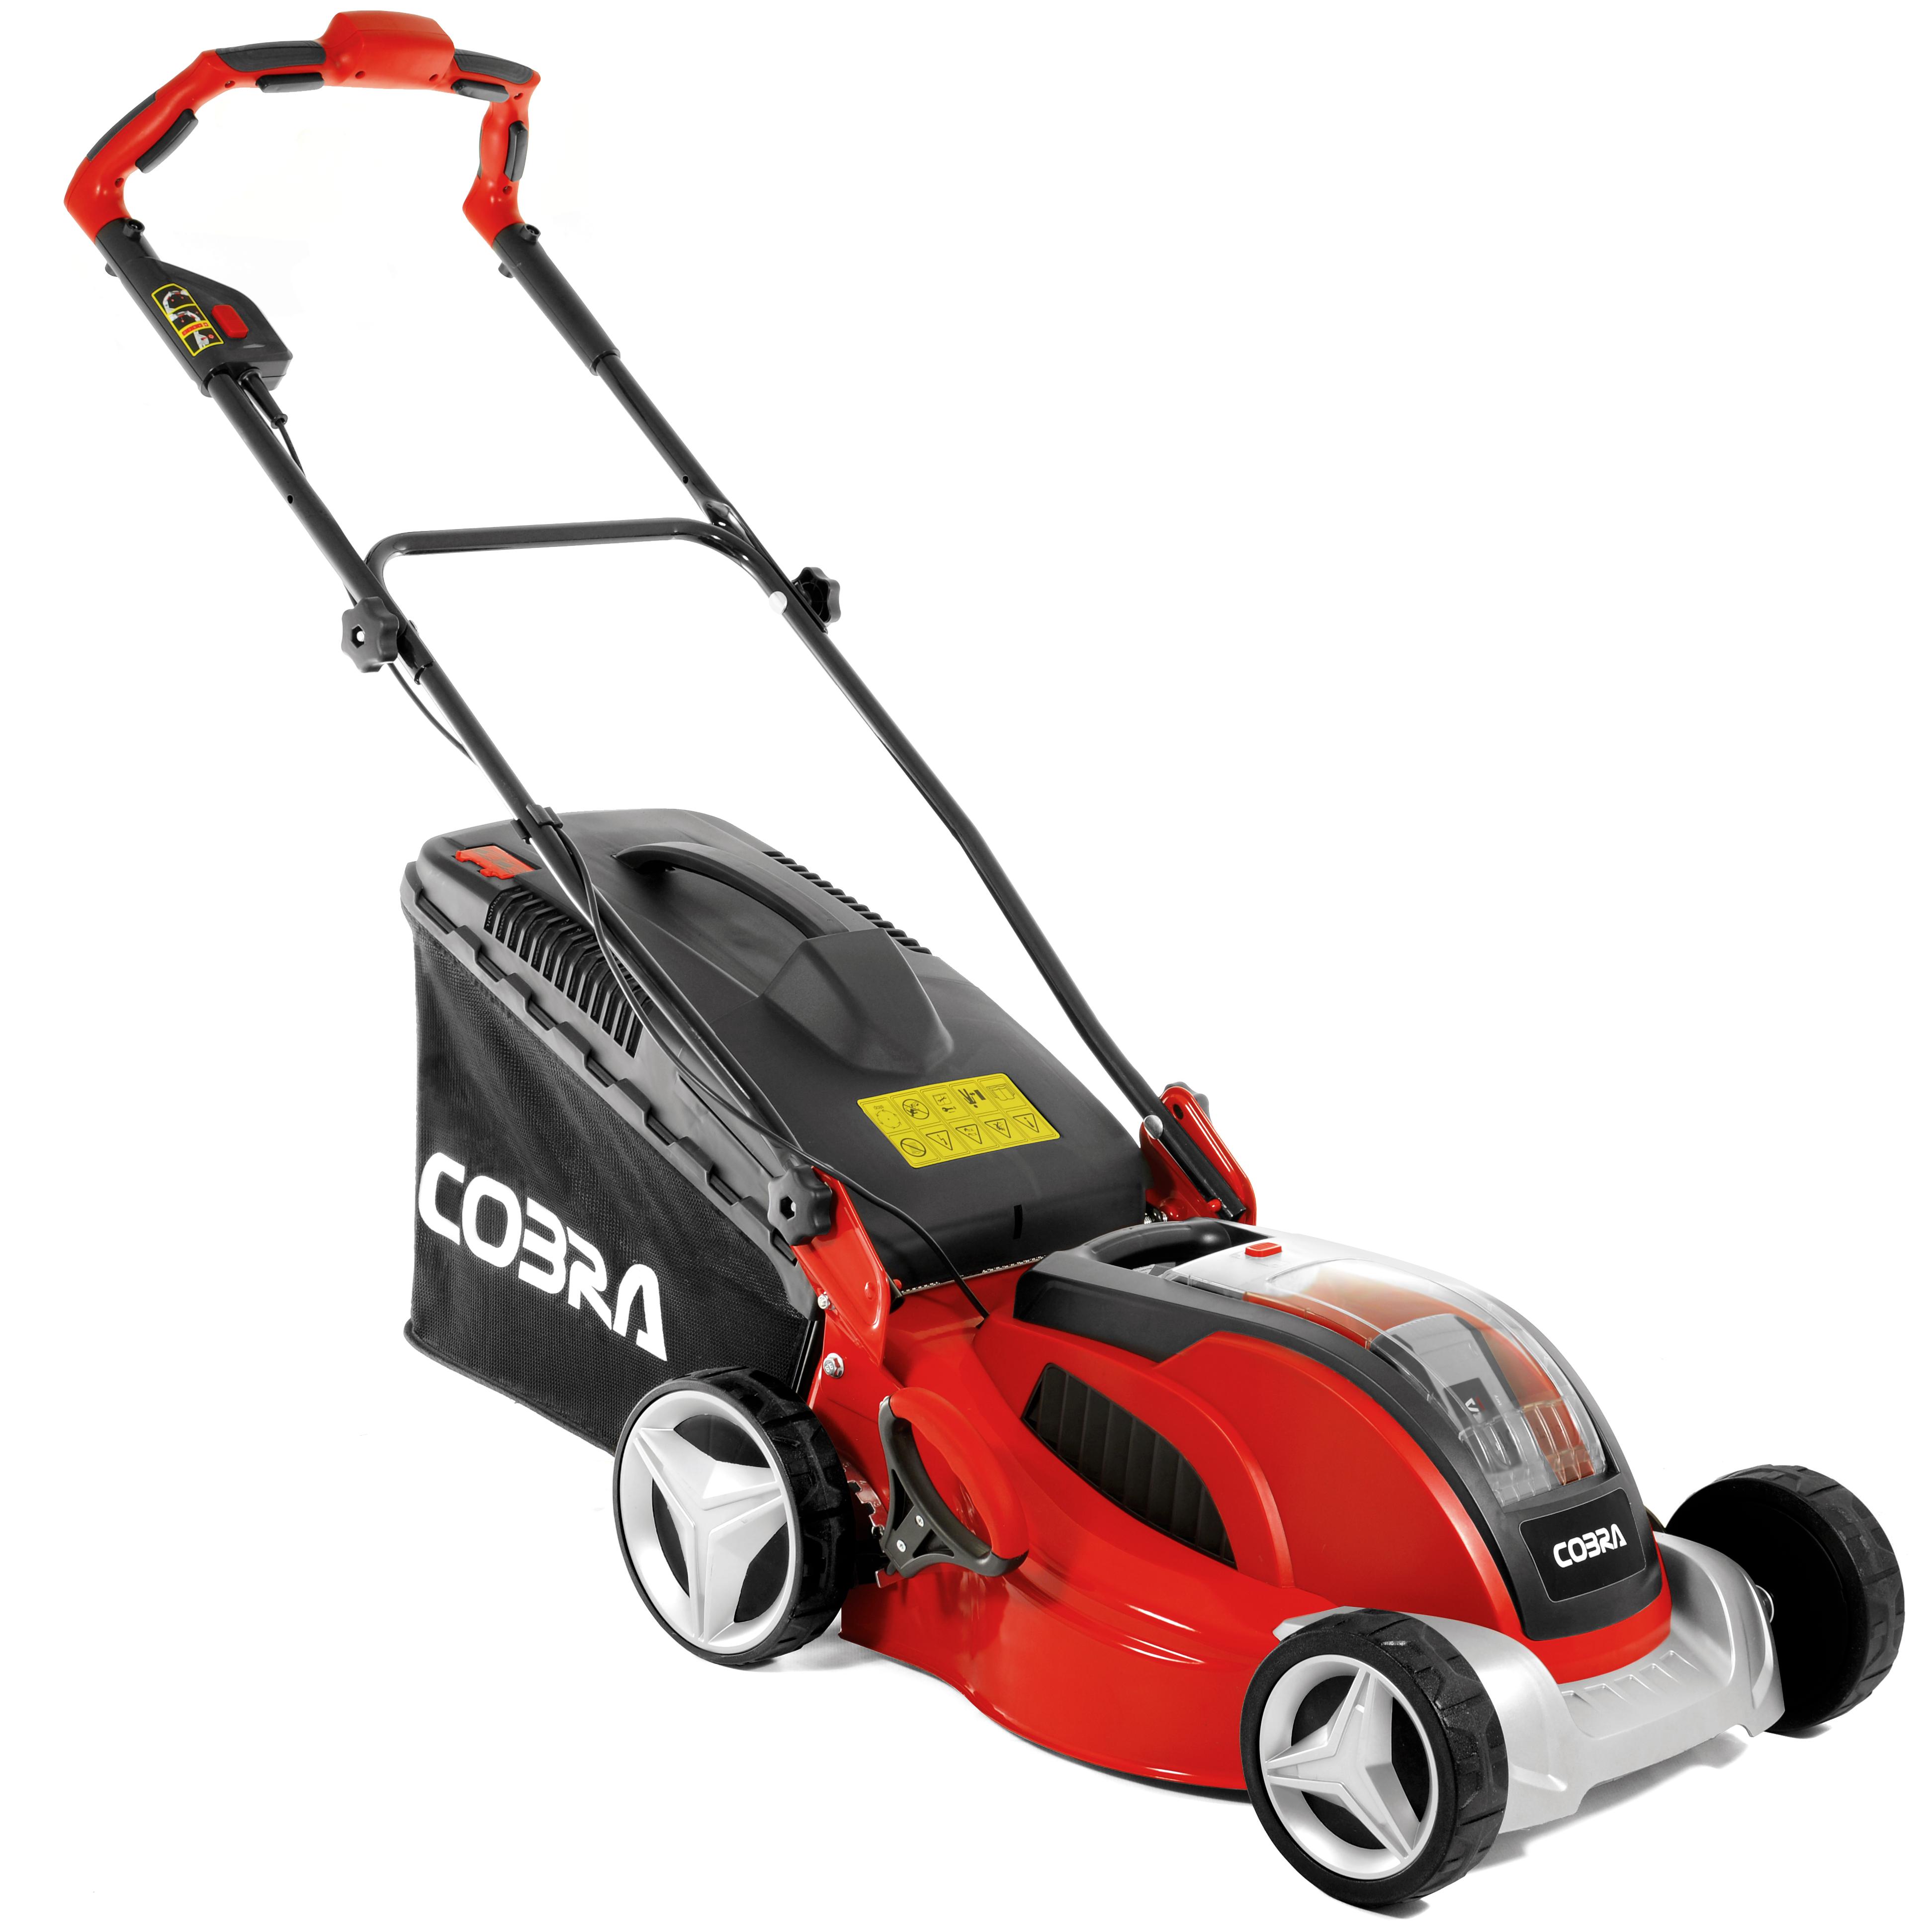 Cobra MX4140V